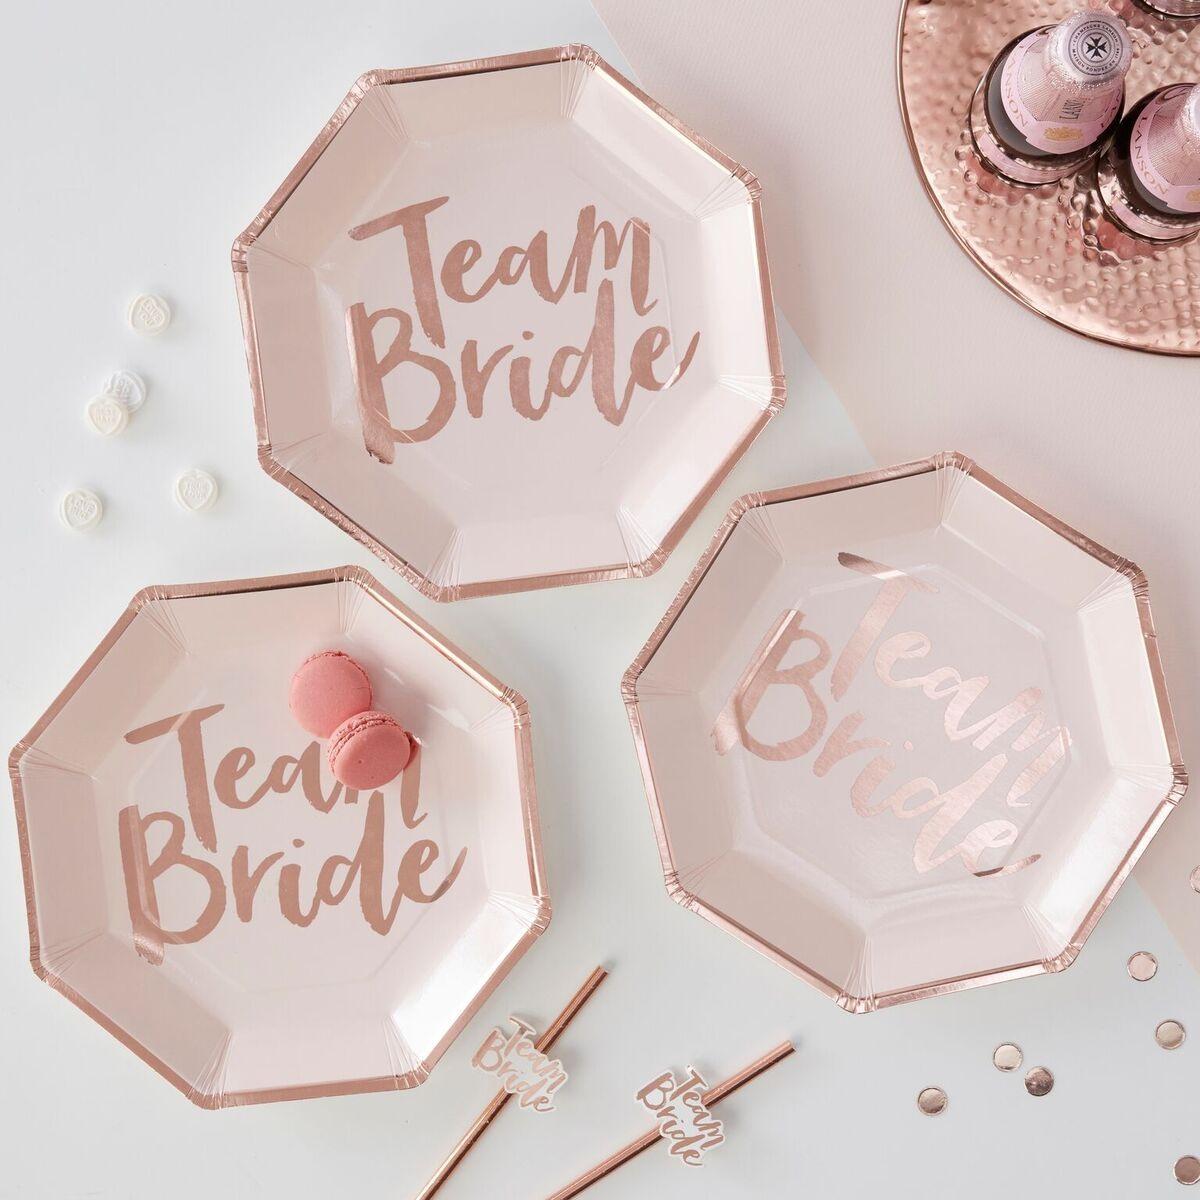 Rose Gold Foiled Team Bride Paper Plates